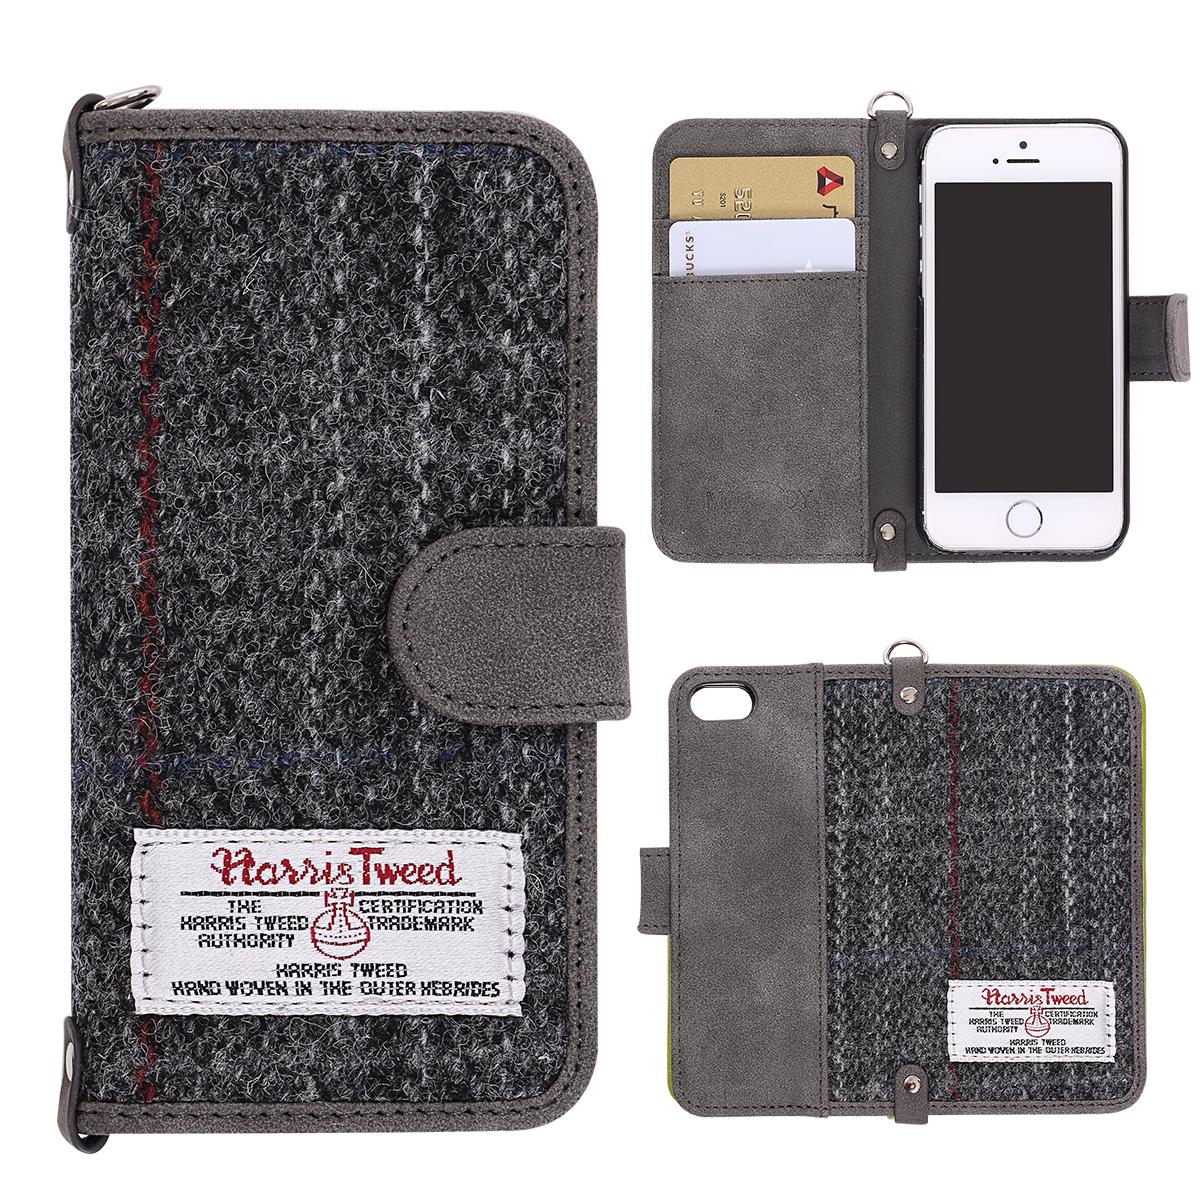 Harris Tweed Monojoy GK iPhone 5 Case Cover iPhone 5s Case iPhone SE Case Cover